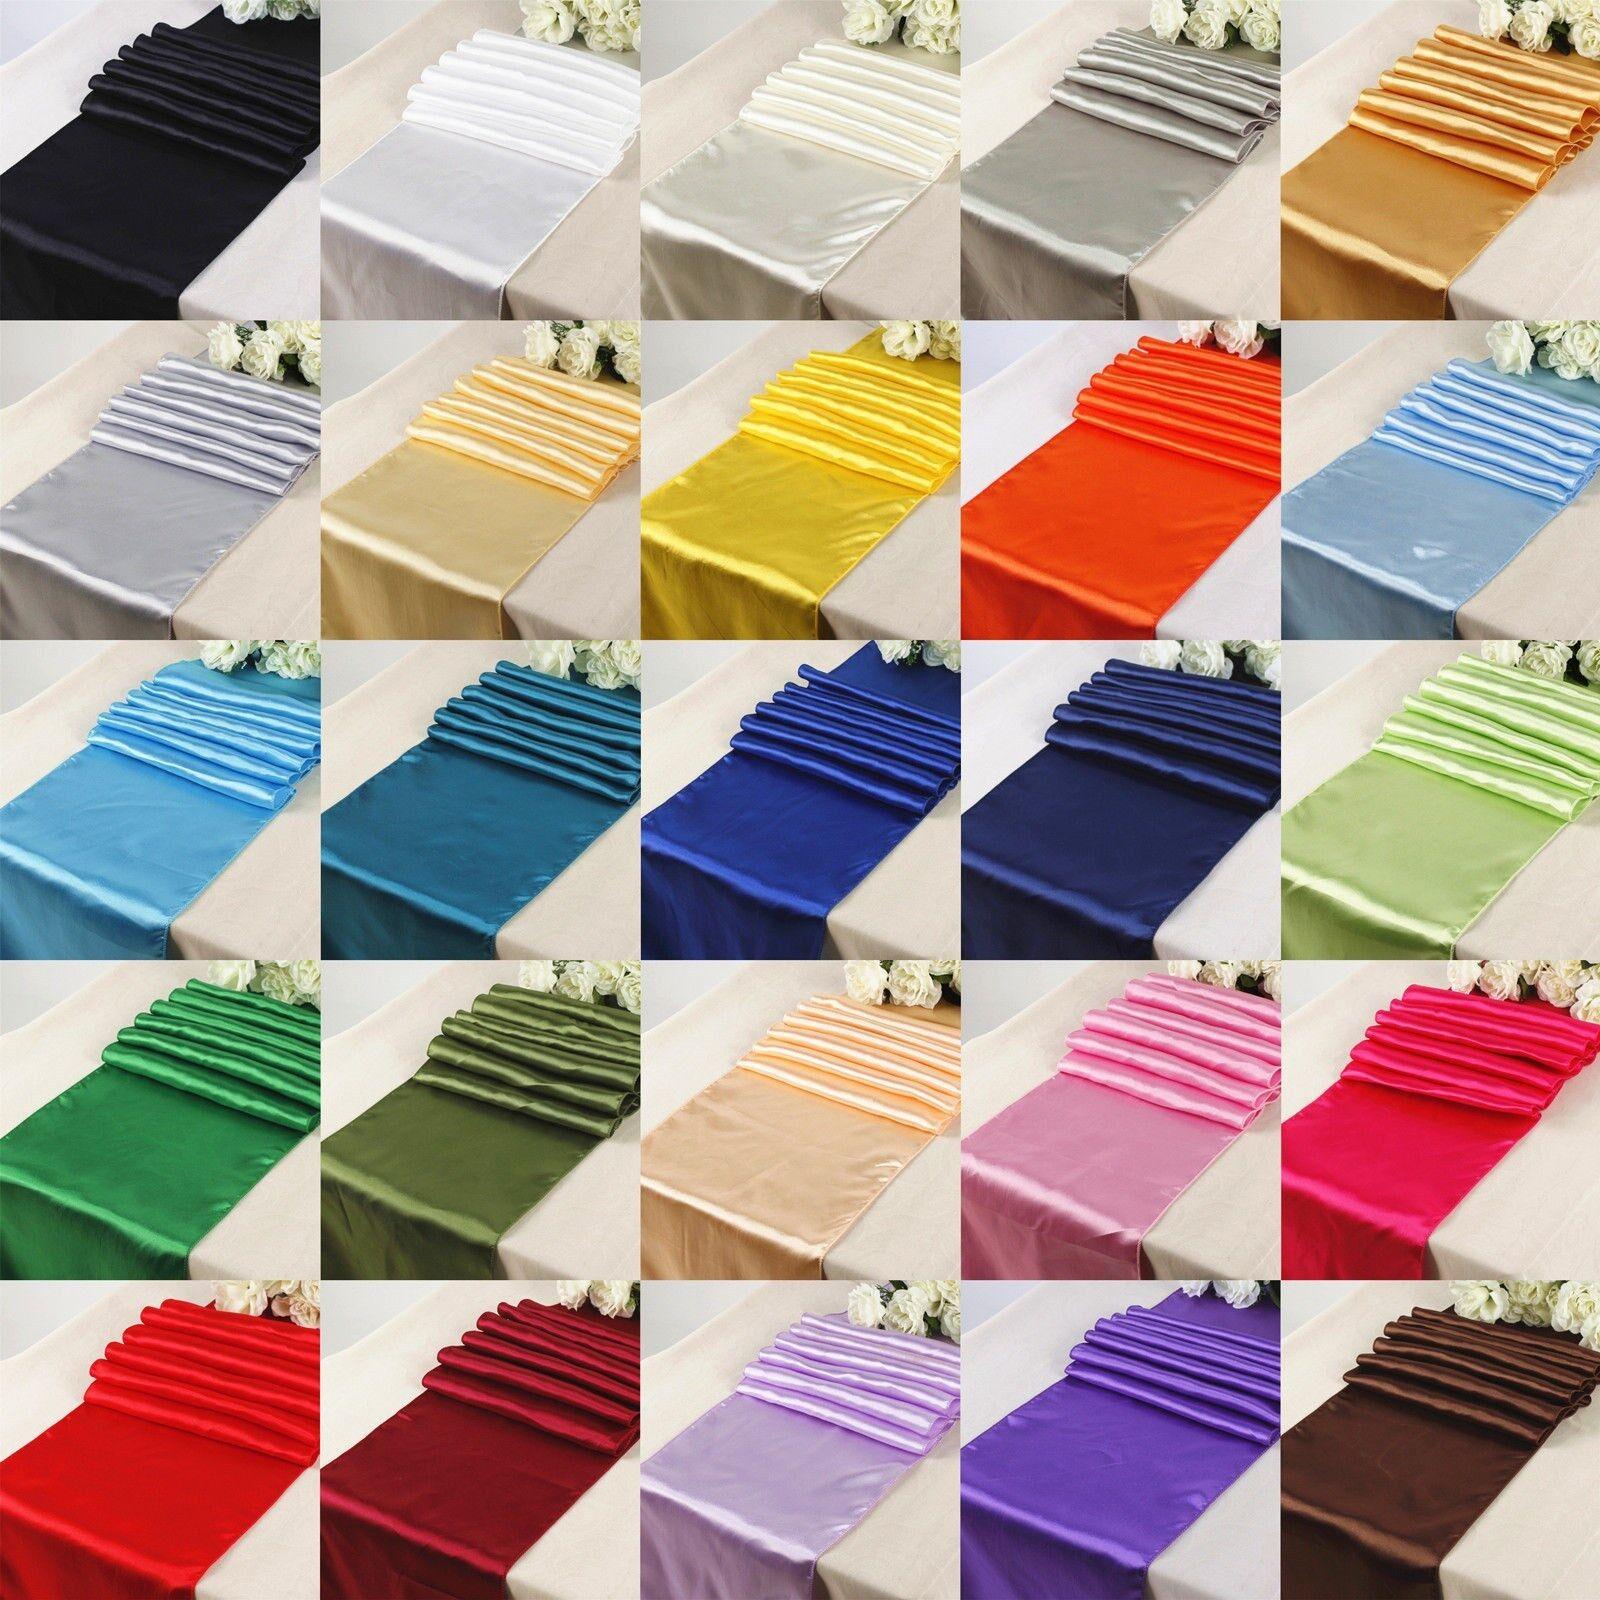 Satin Aisle Runner 50 Ft (environ 15.24 m) de long 60  Large 100% Sans Couture Tissu Made in USA Mariage